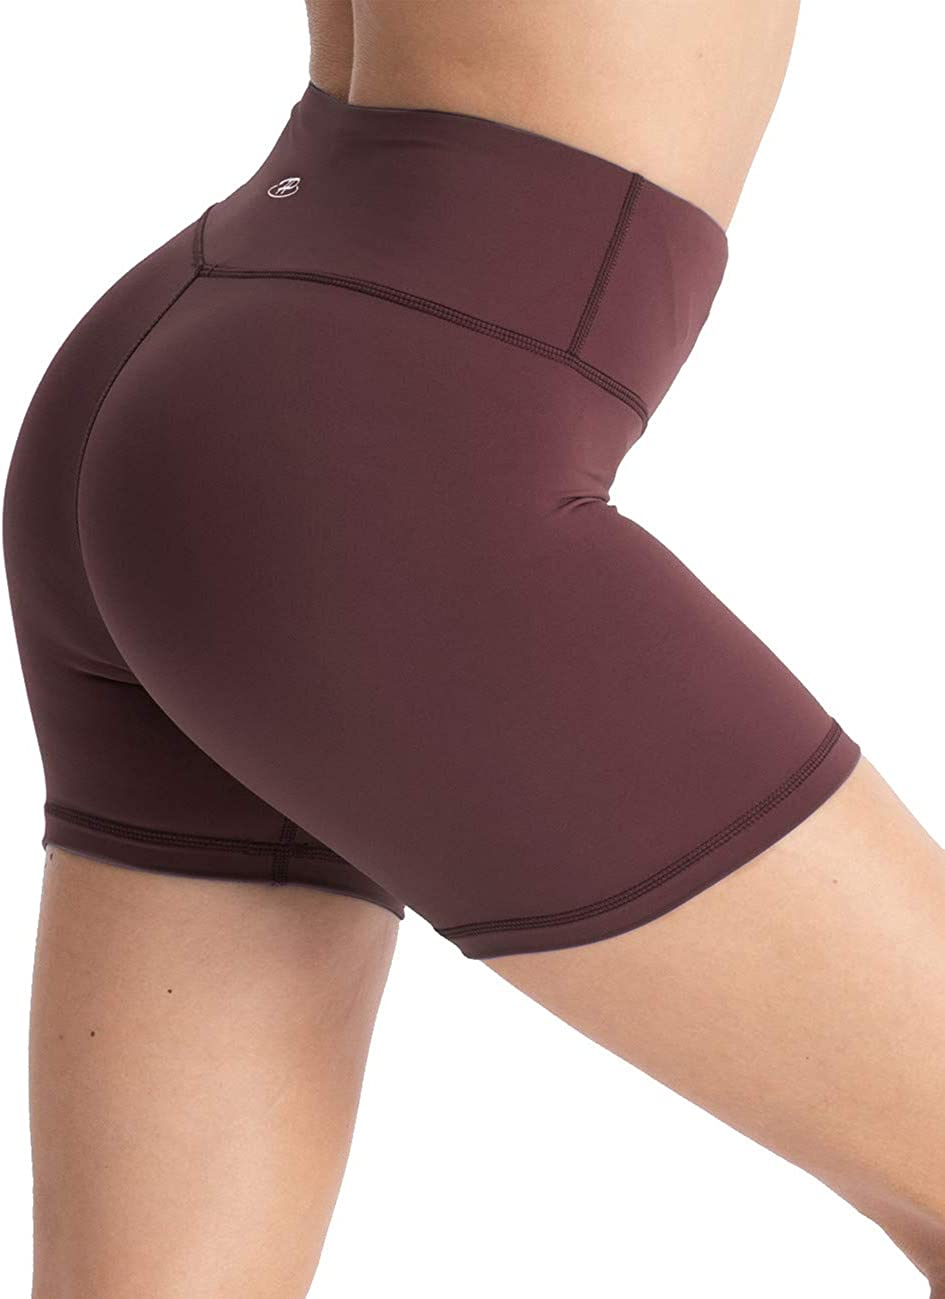 Hopgo Womens 4 Training Bike Shorts High Waist Worktout Shorts Tummy Control Yoga Shorts Tight Inner Pocket